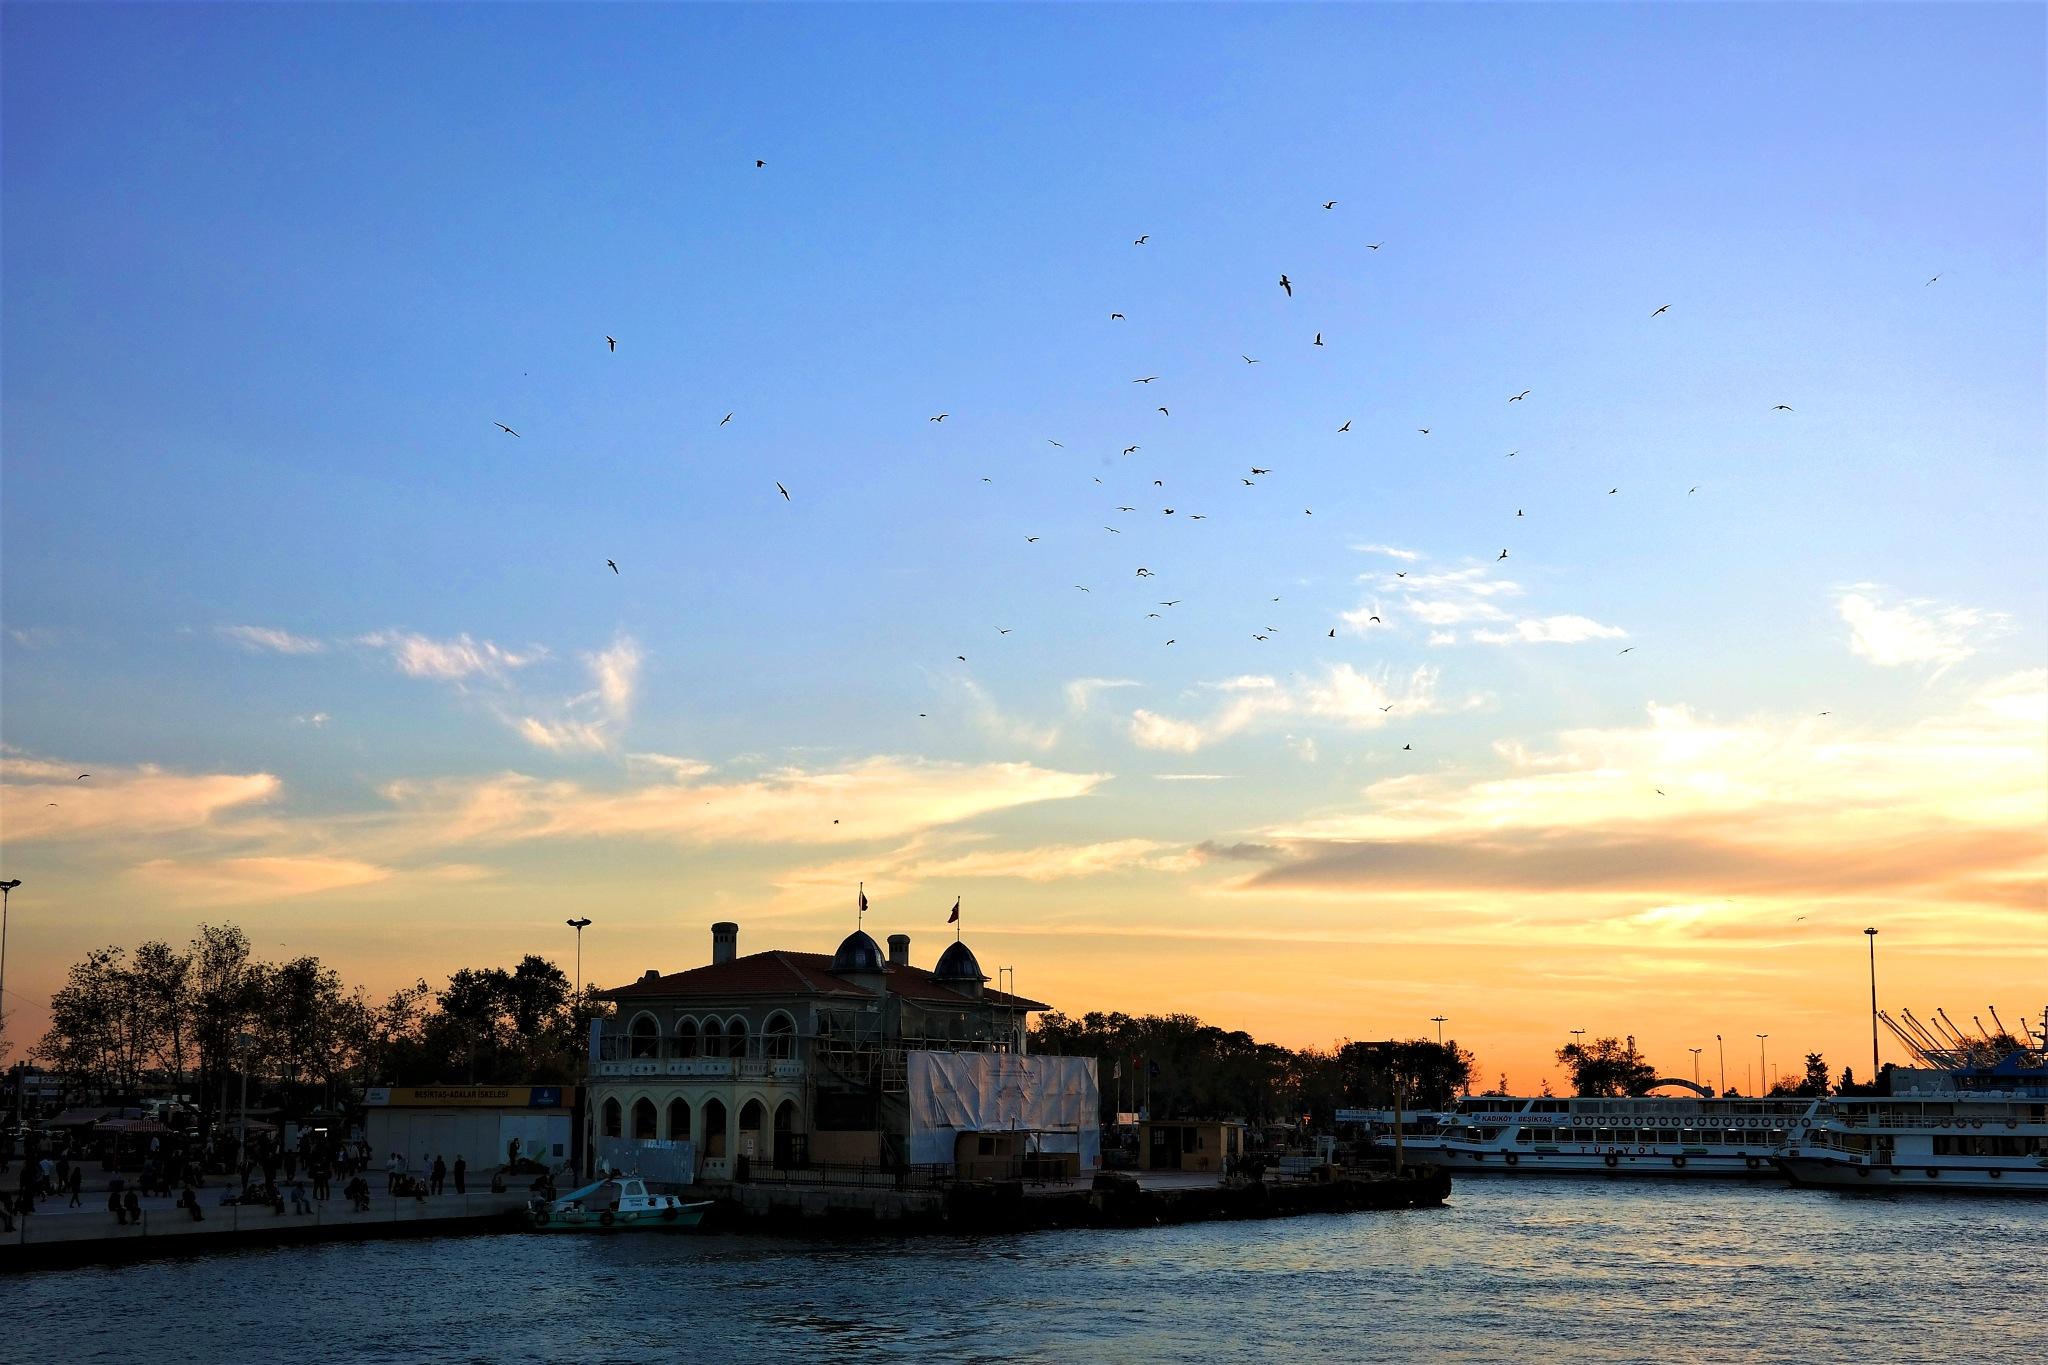 birds over the pier by Muhsin Özcan